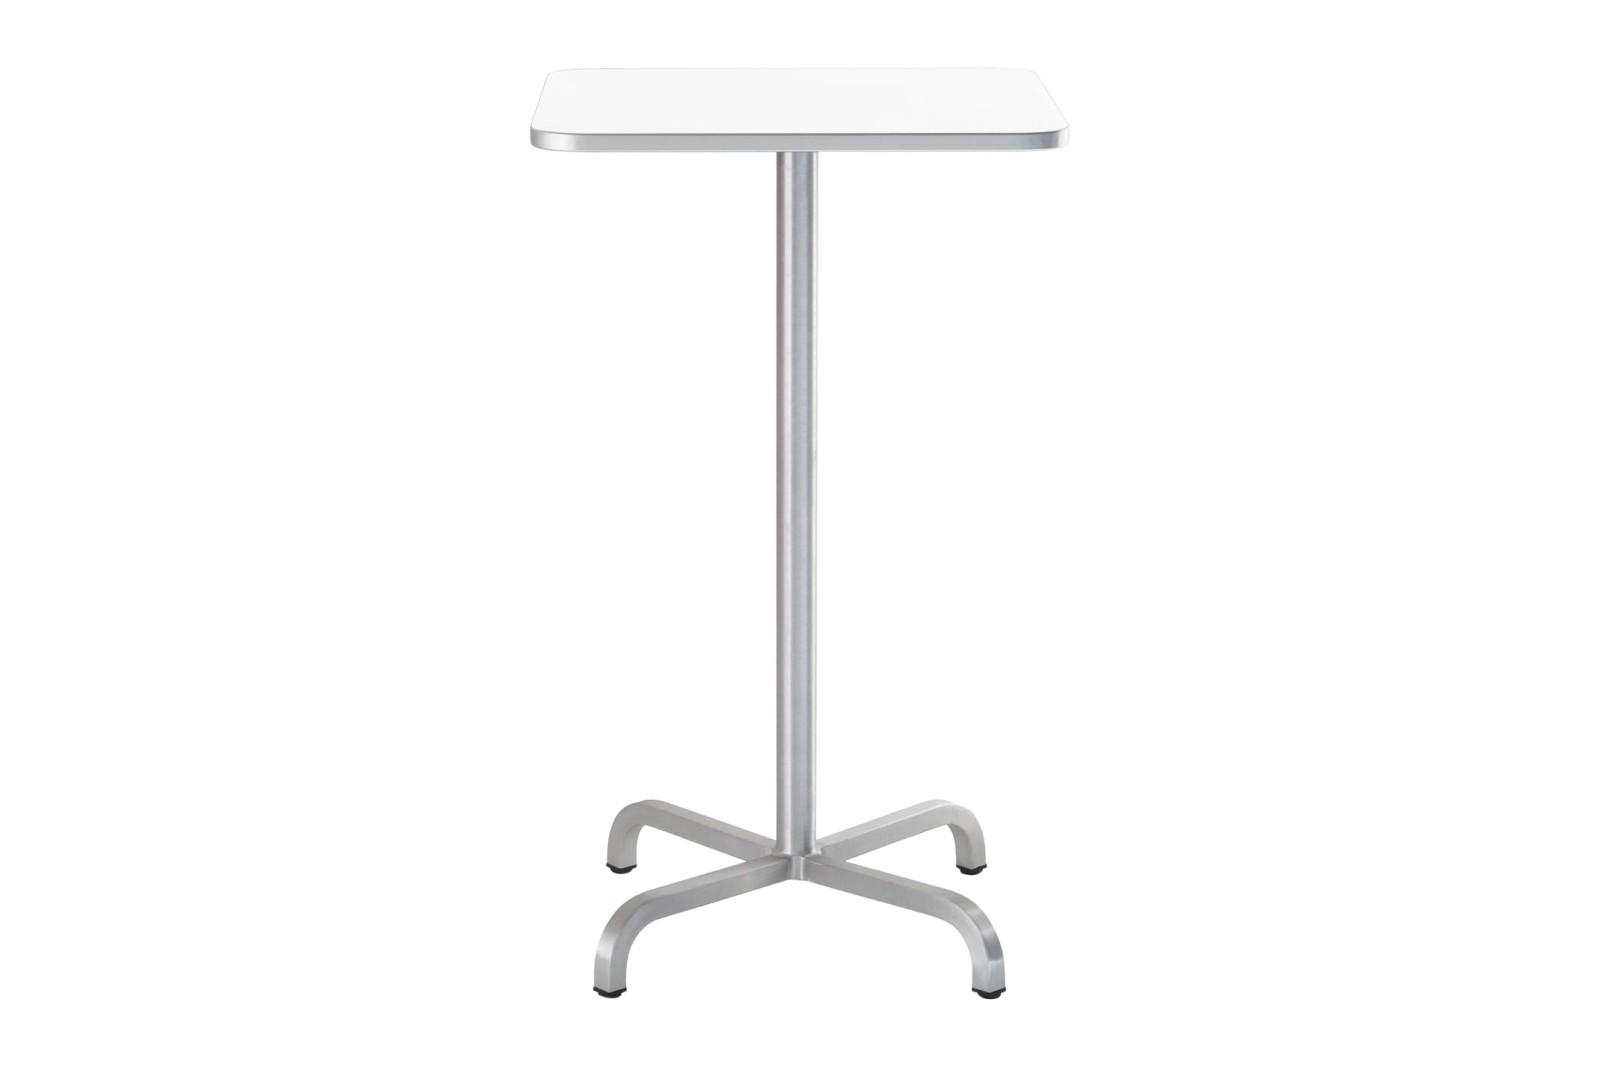 20-06 Square Bar-Height Table White Laminate Top, Matt Aluminium Edge, 106 x 60 x 60 cm